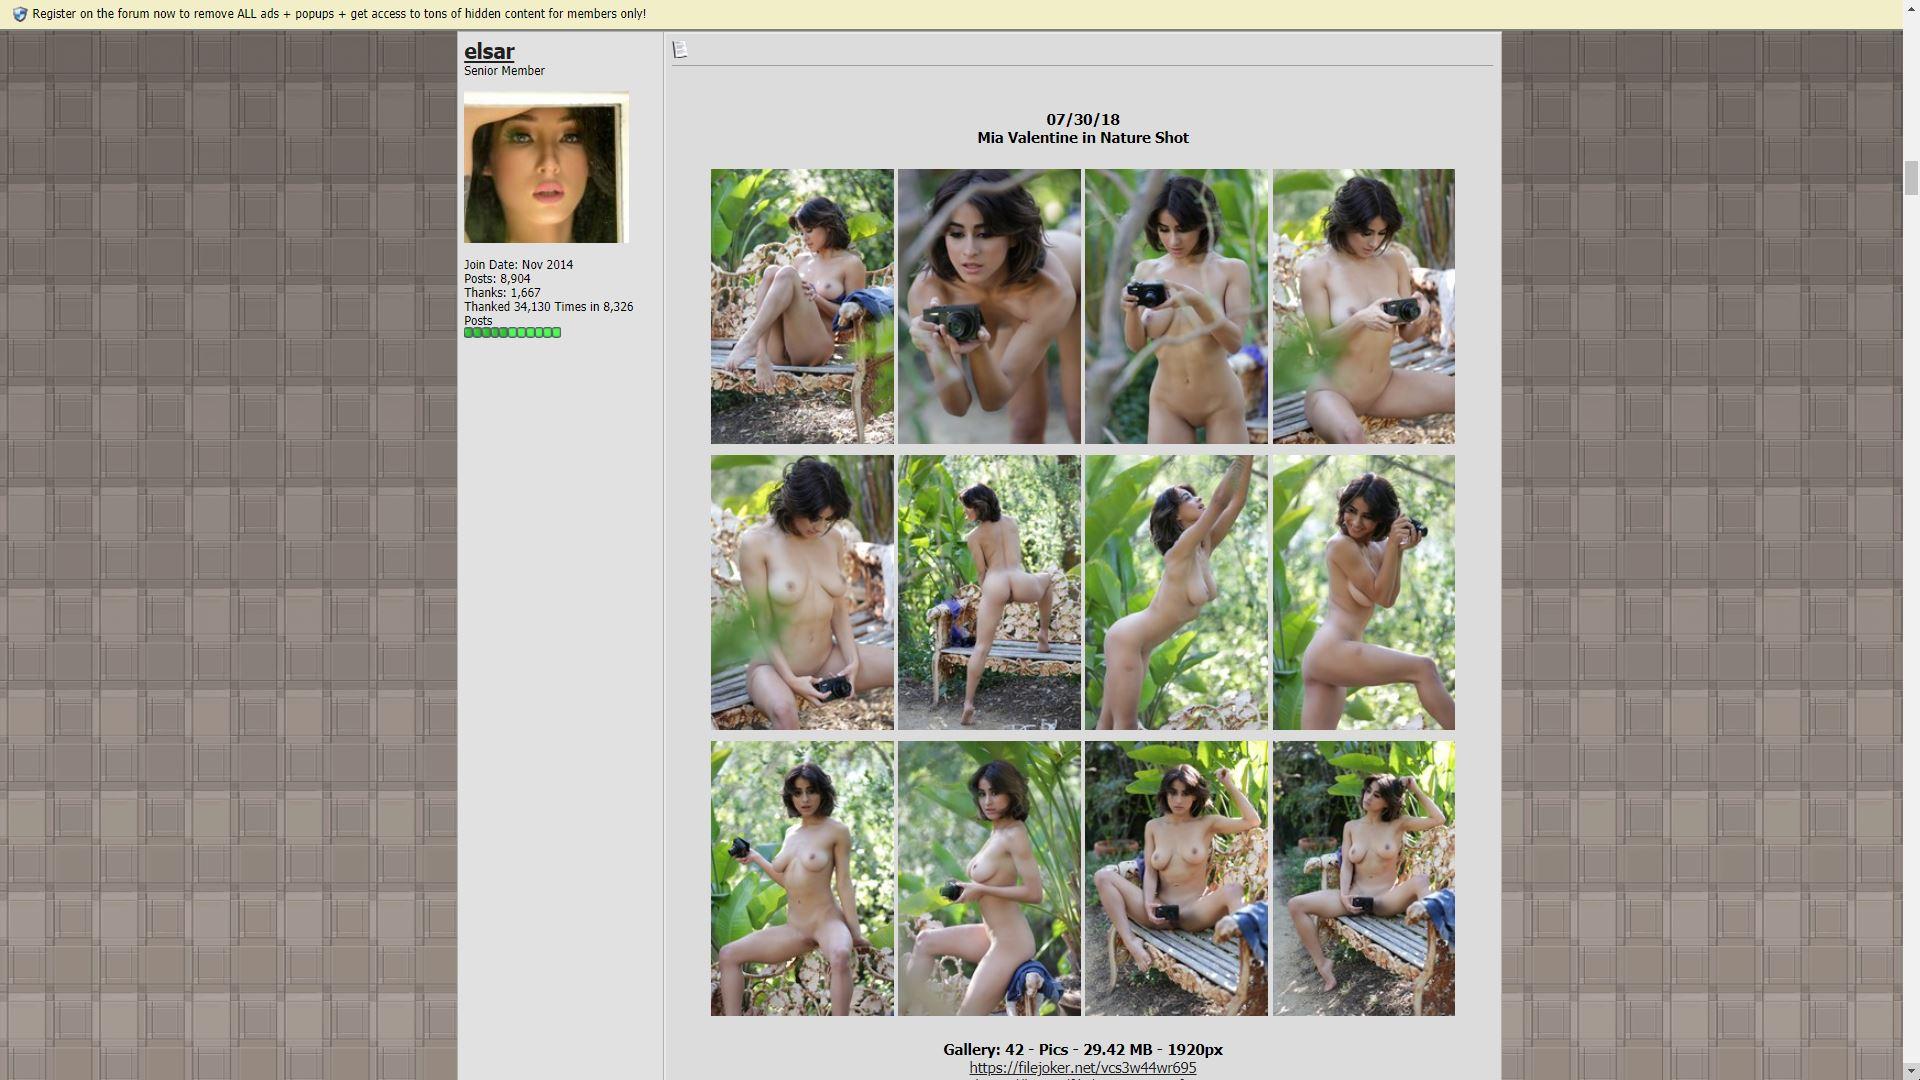 Nude Celeb Forum Mia Valentine In Nature Shot